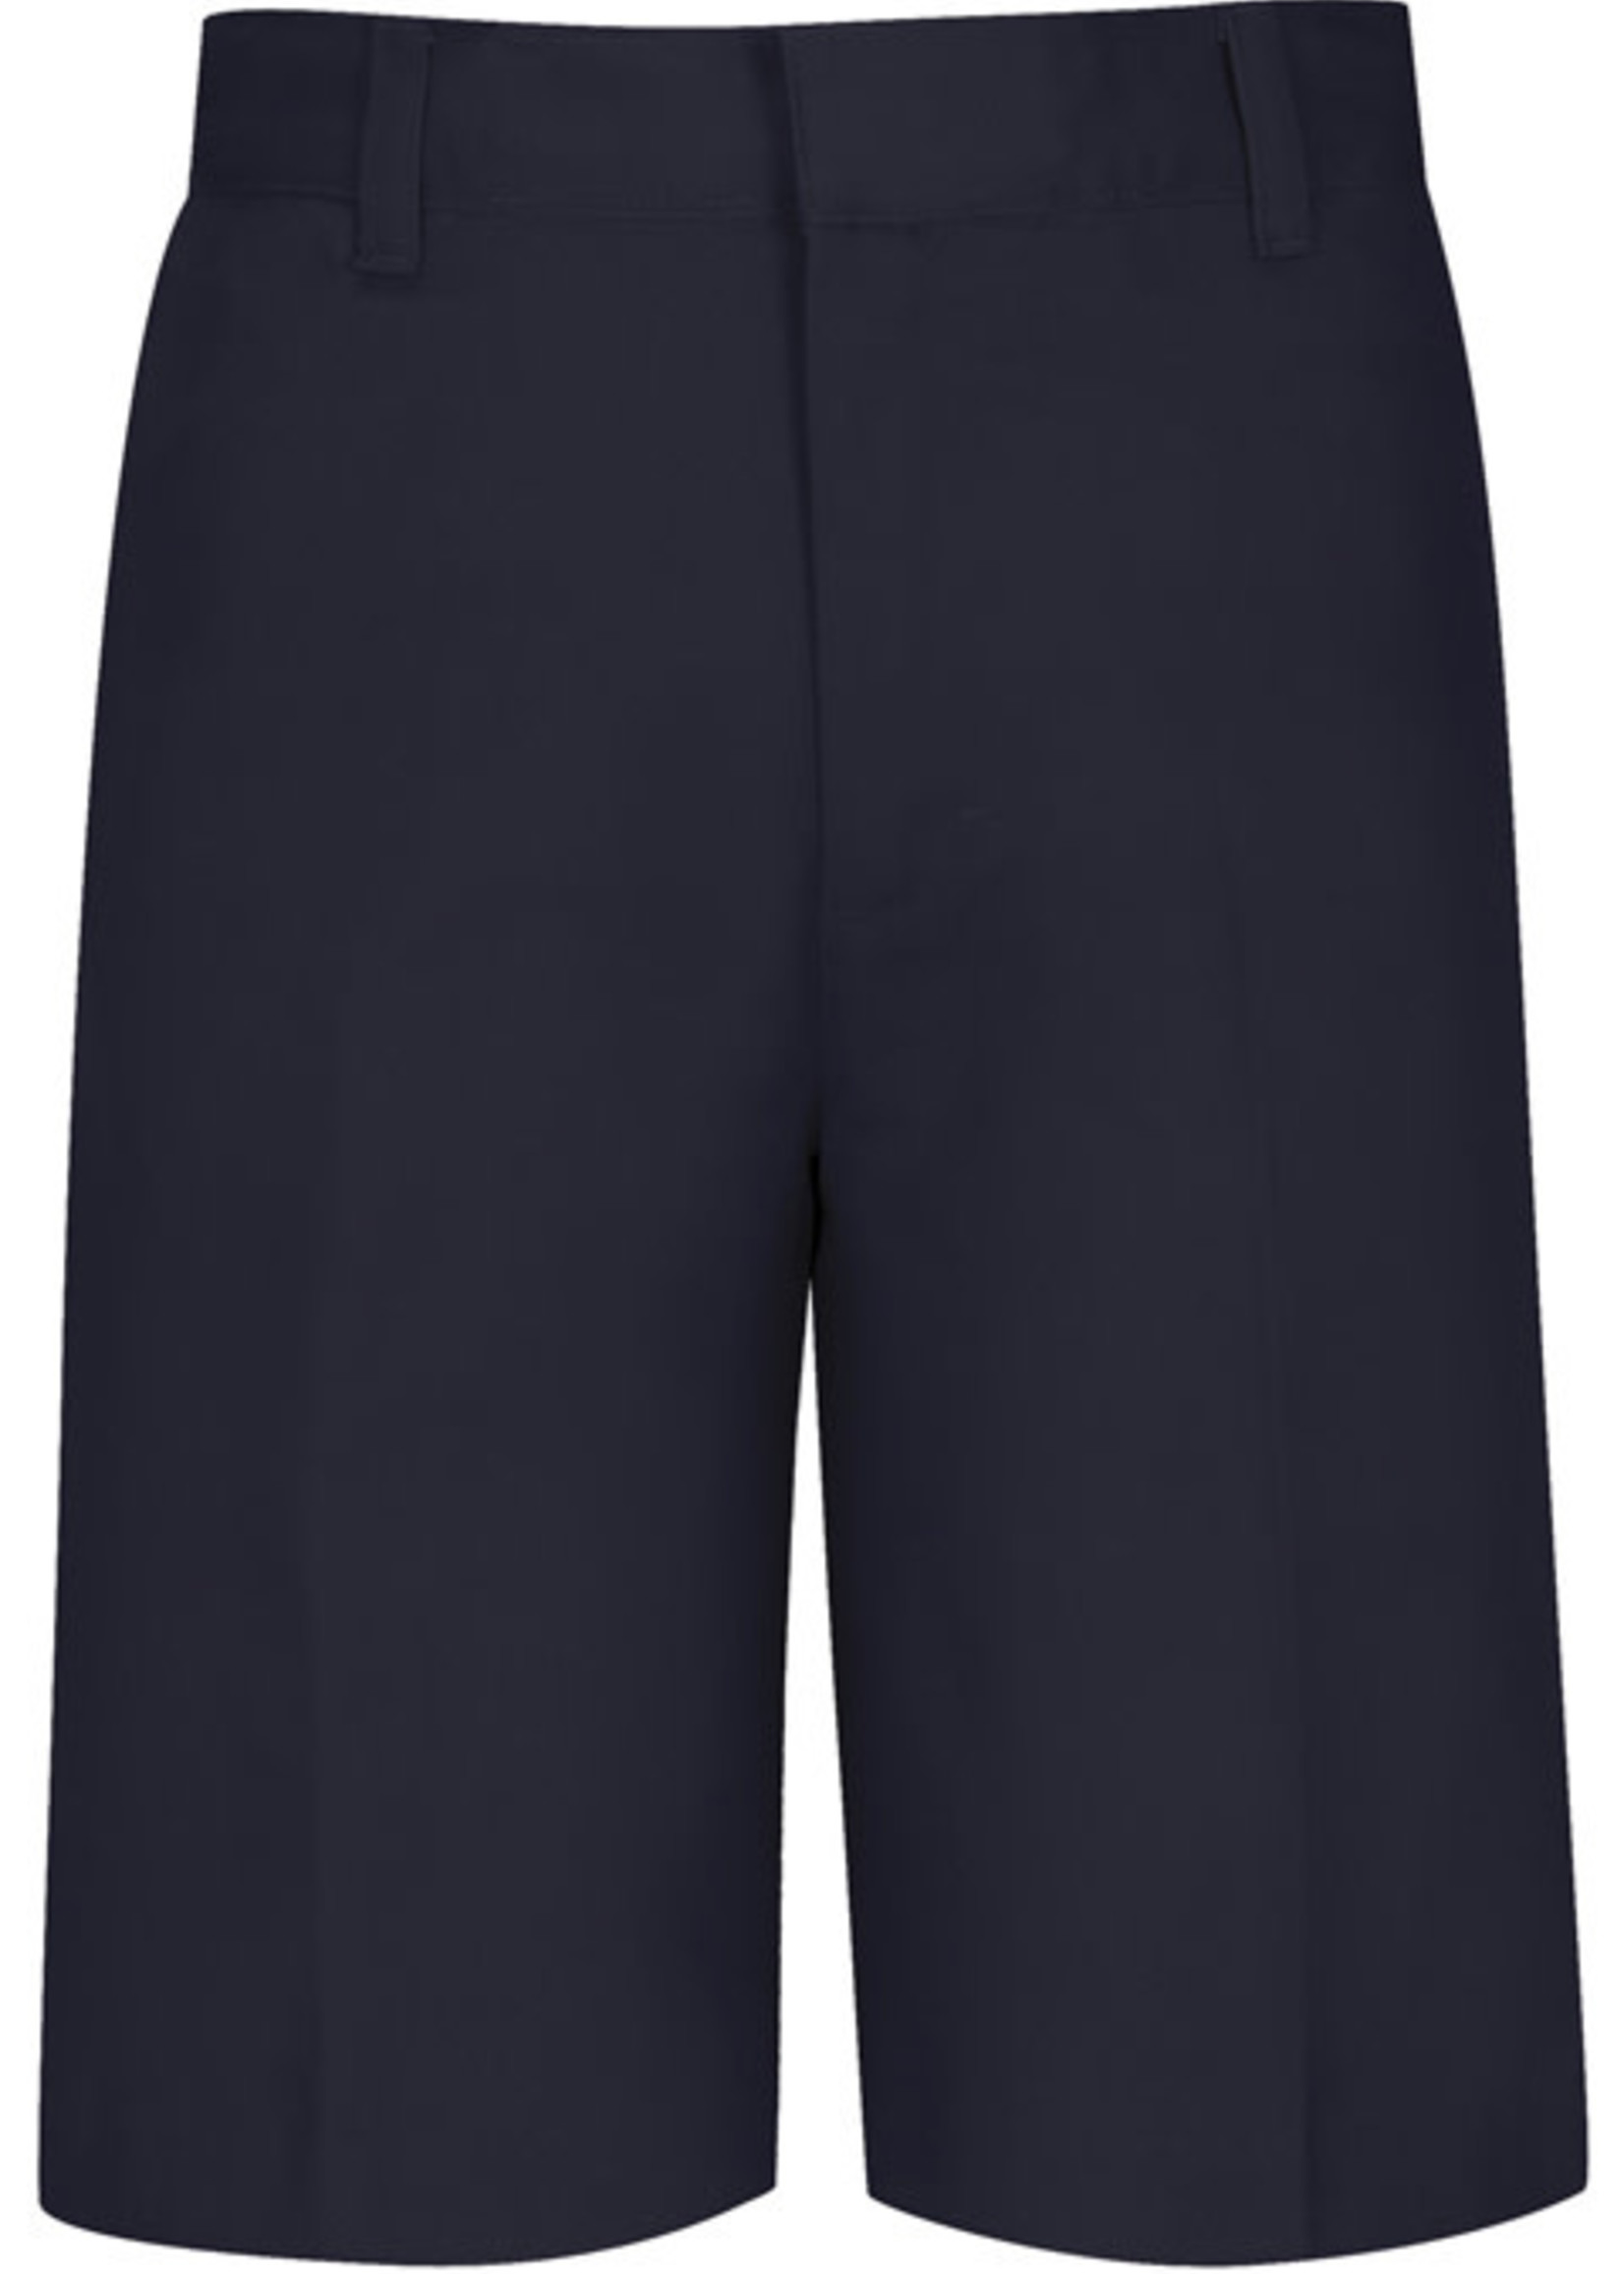 Mens Value Flat Front Shorts